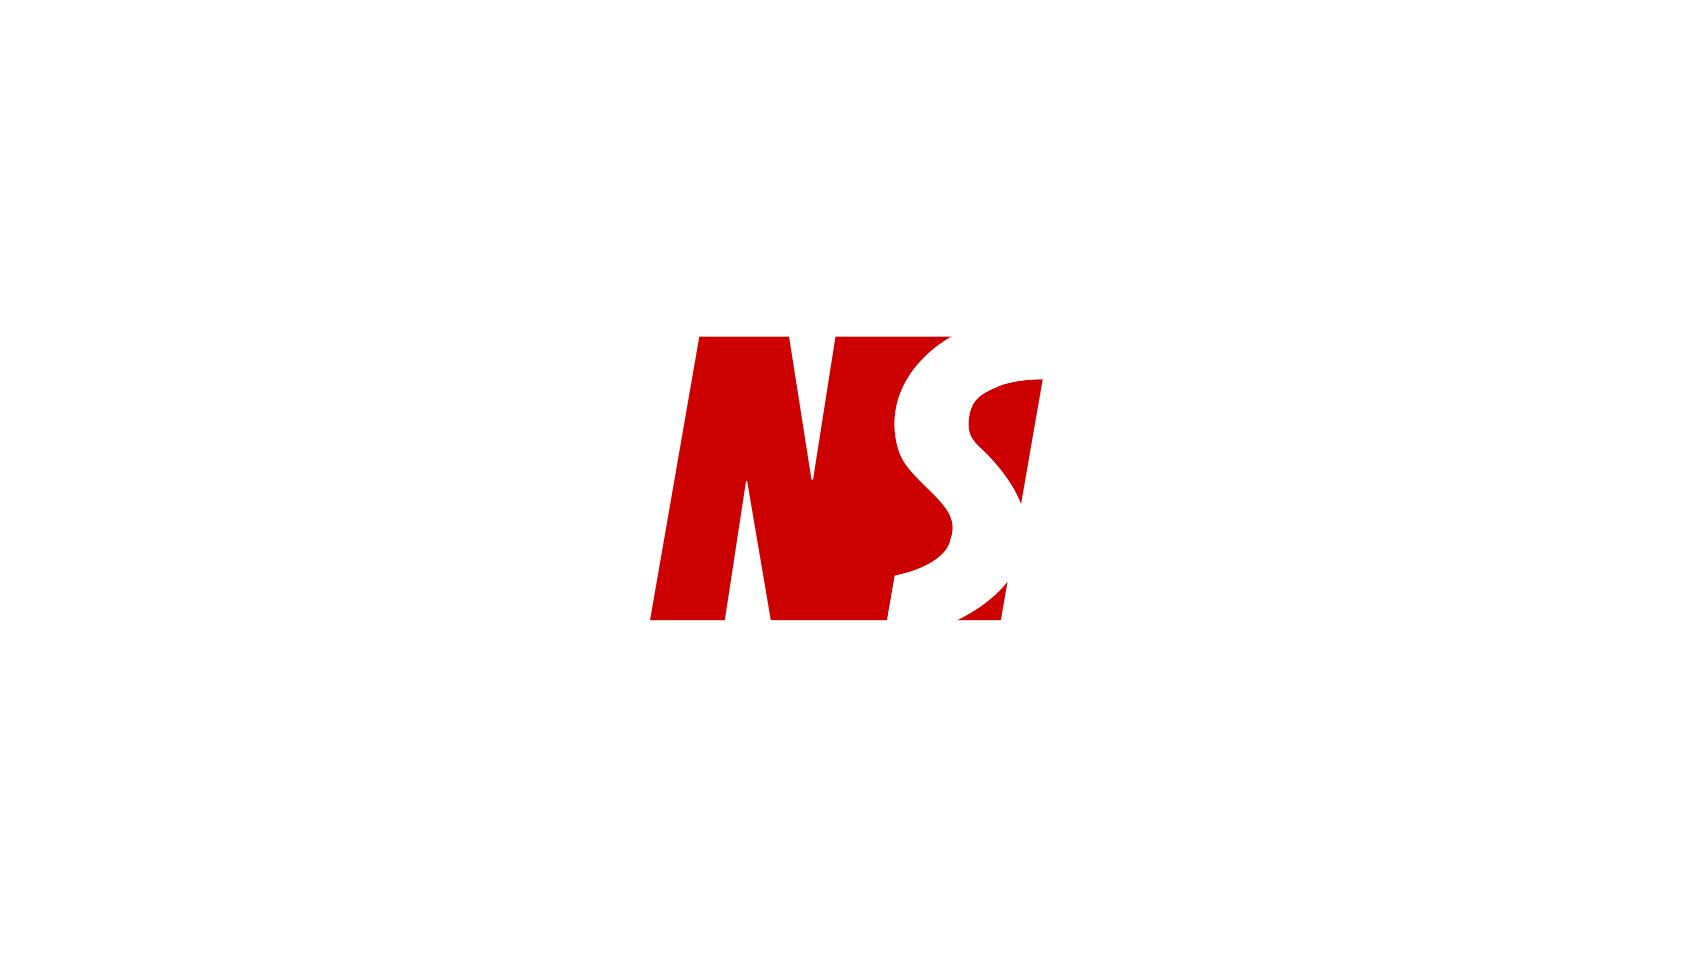 NewSPO.のロゴマーク